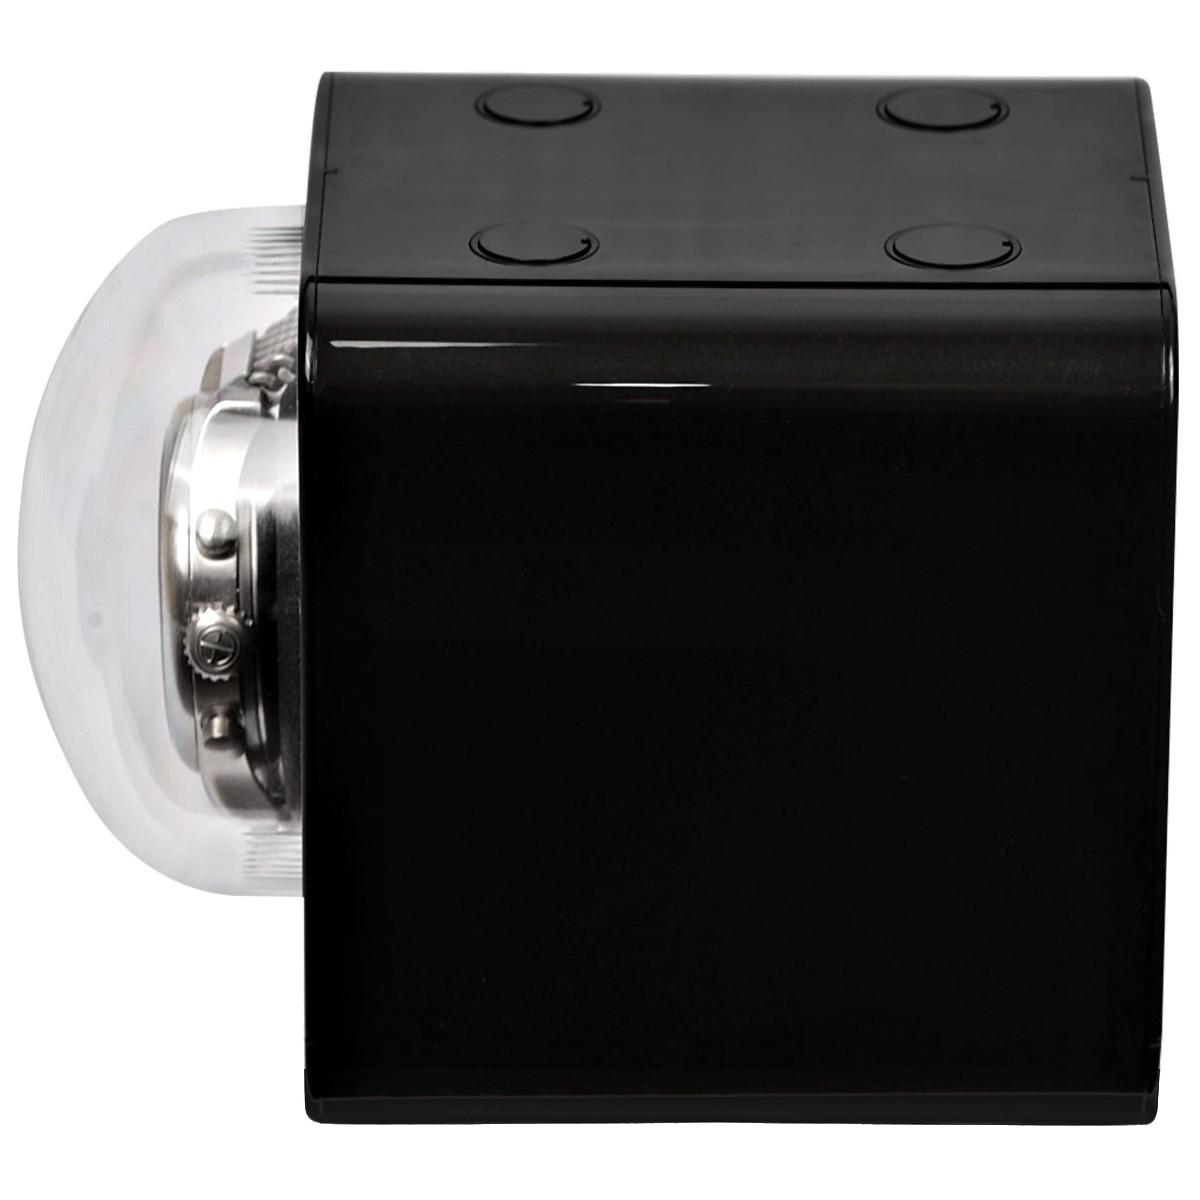 Modulare Uhrenbeweger Boxy Fancy Pro12 Max Base Black12 ucTJl3F1K